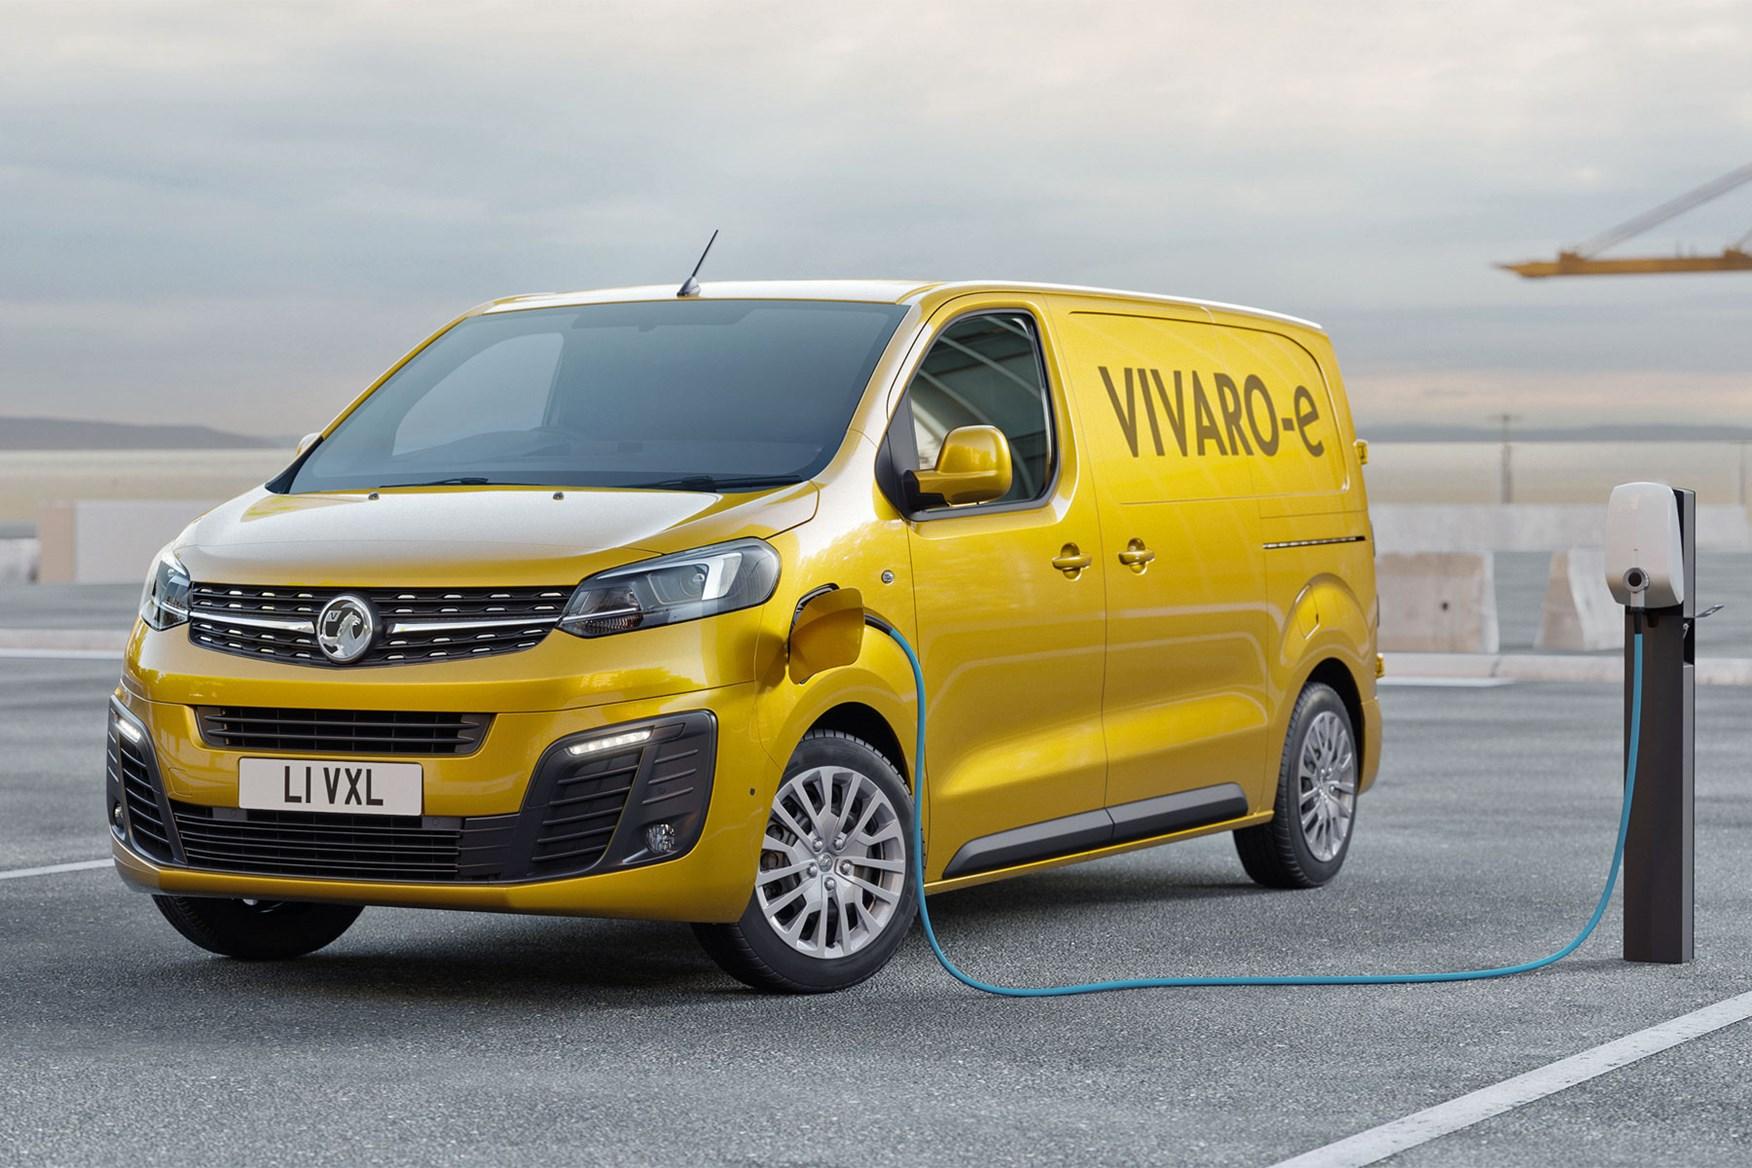 Vauxhall Vivaro-e electric van - charging, yellow, on sale in 2020